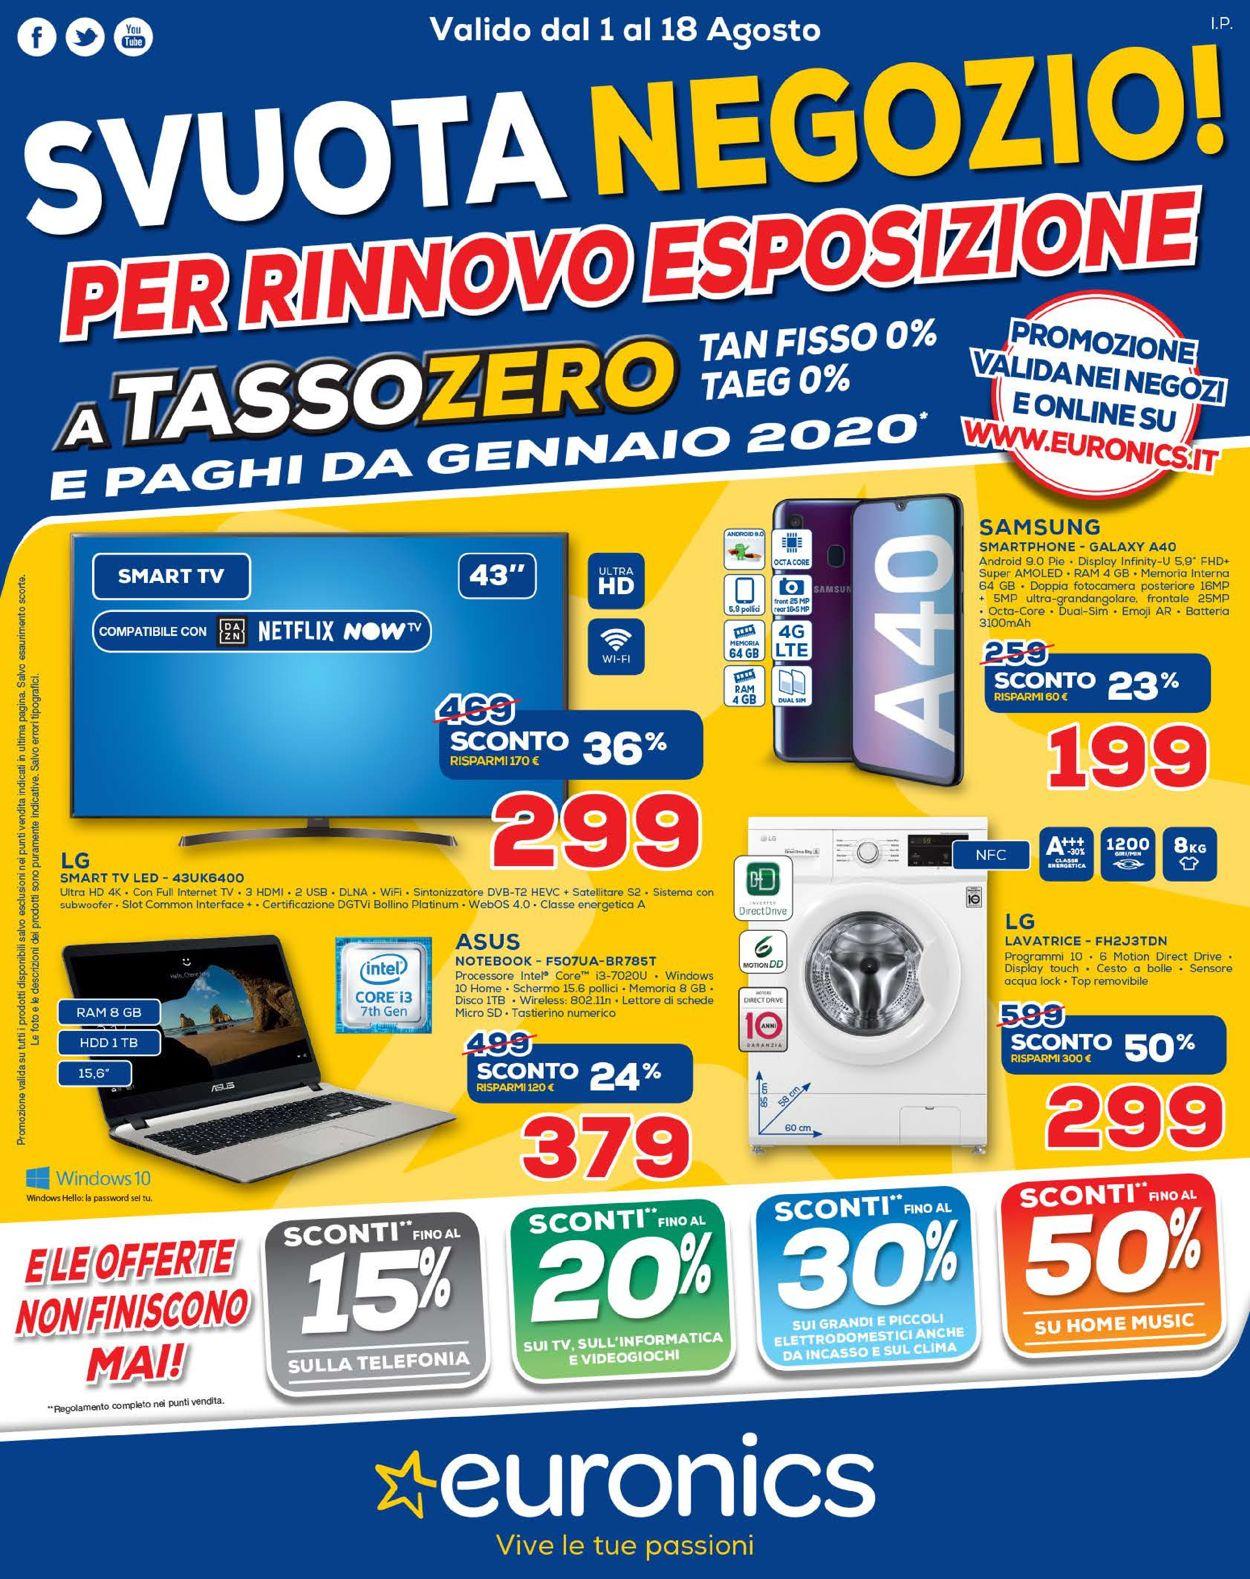 Volantino Euronics - Offerte 01/08-18/08/2019